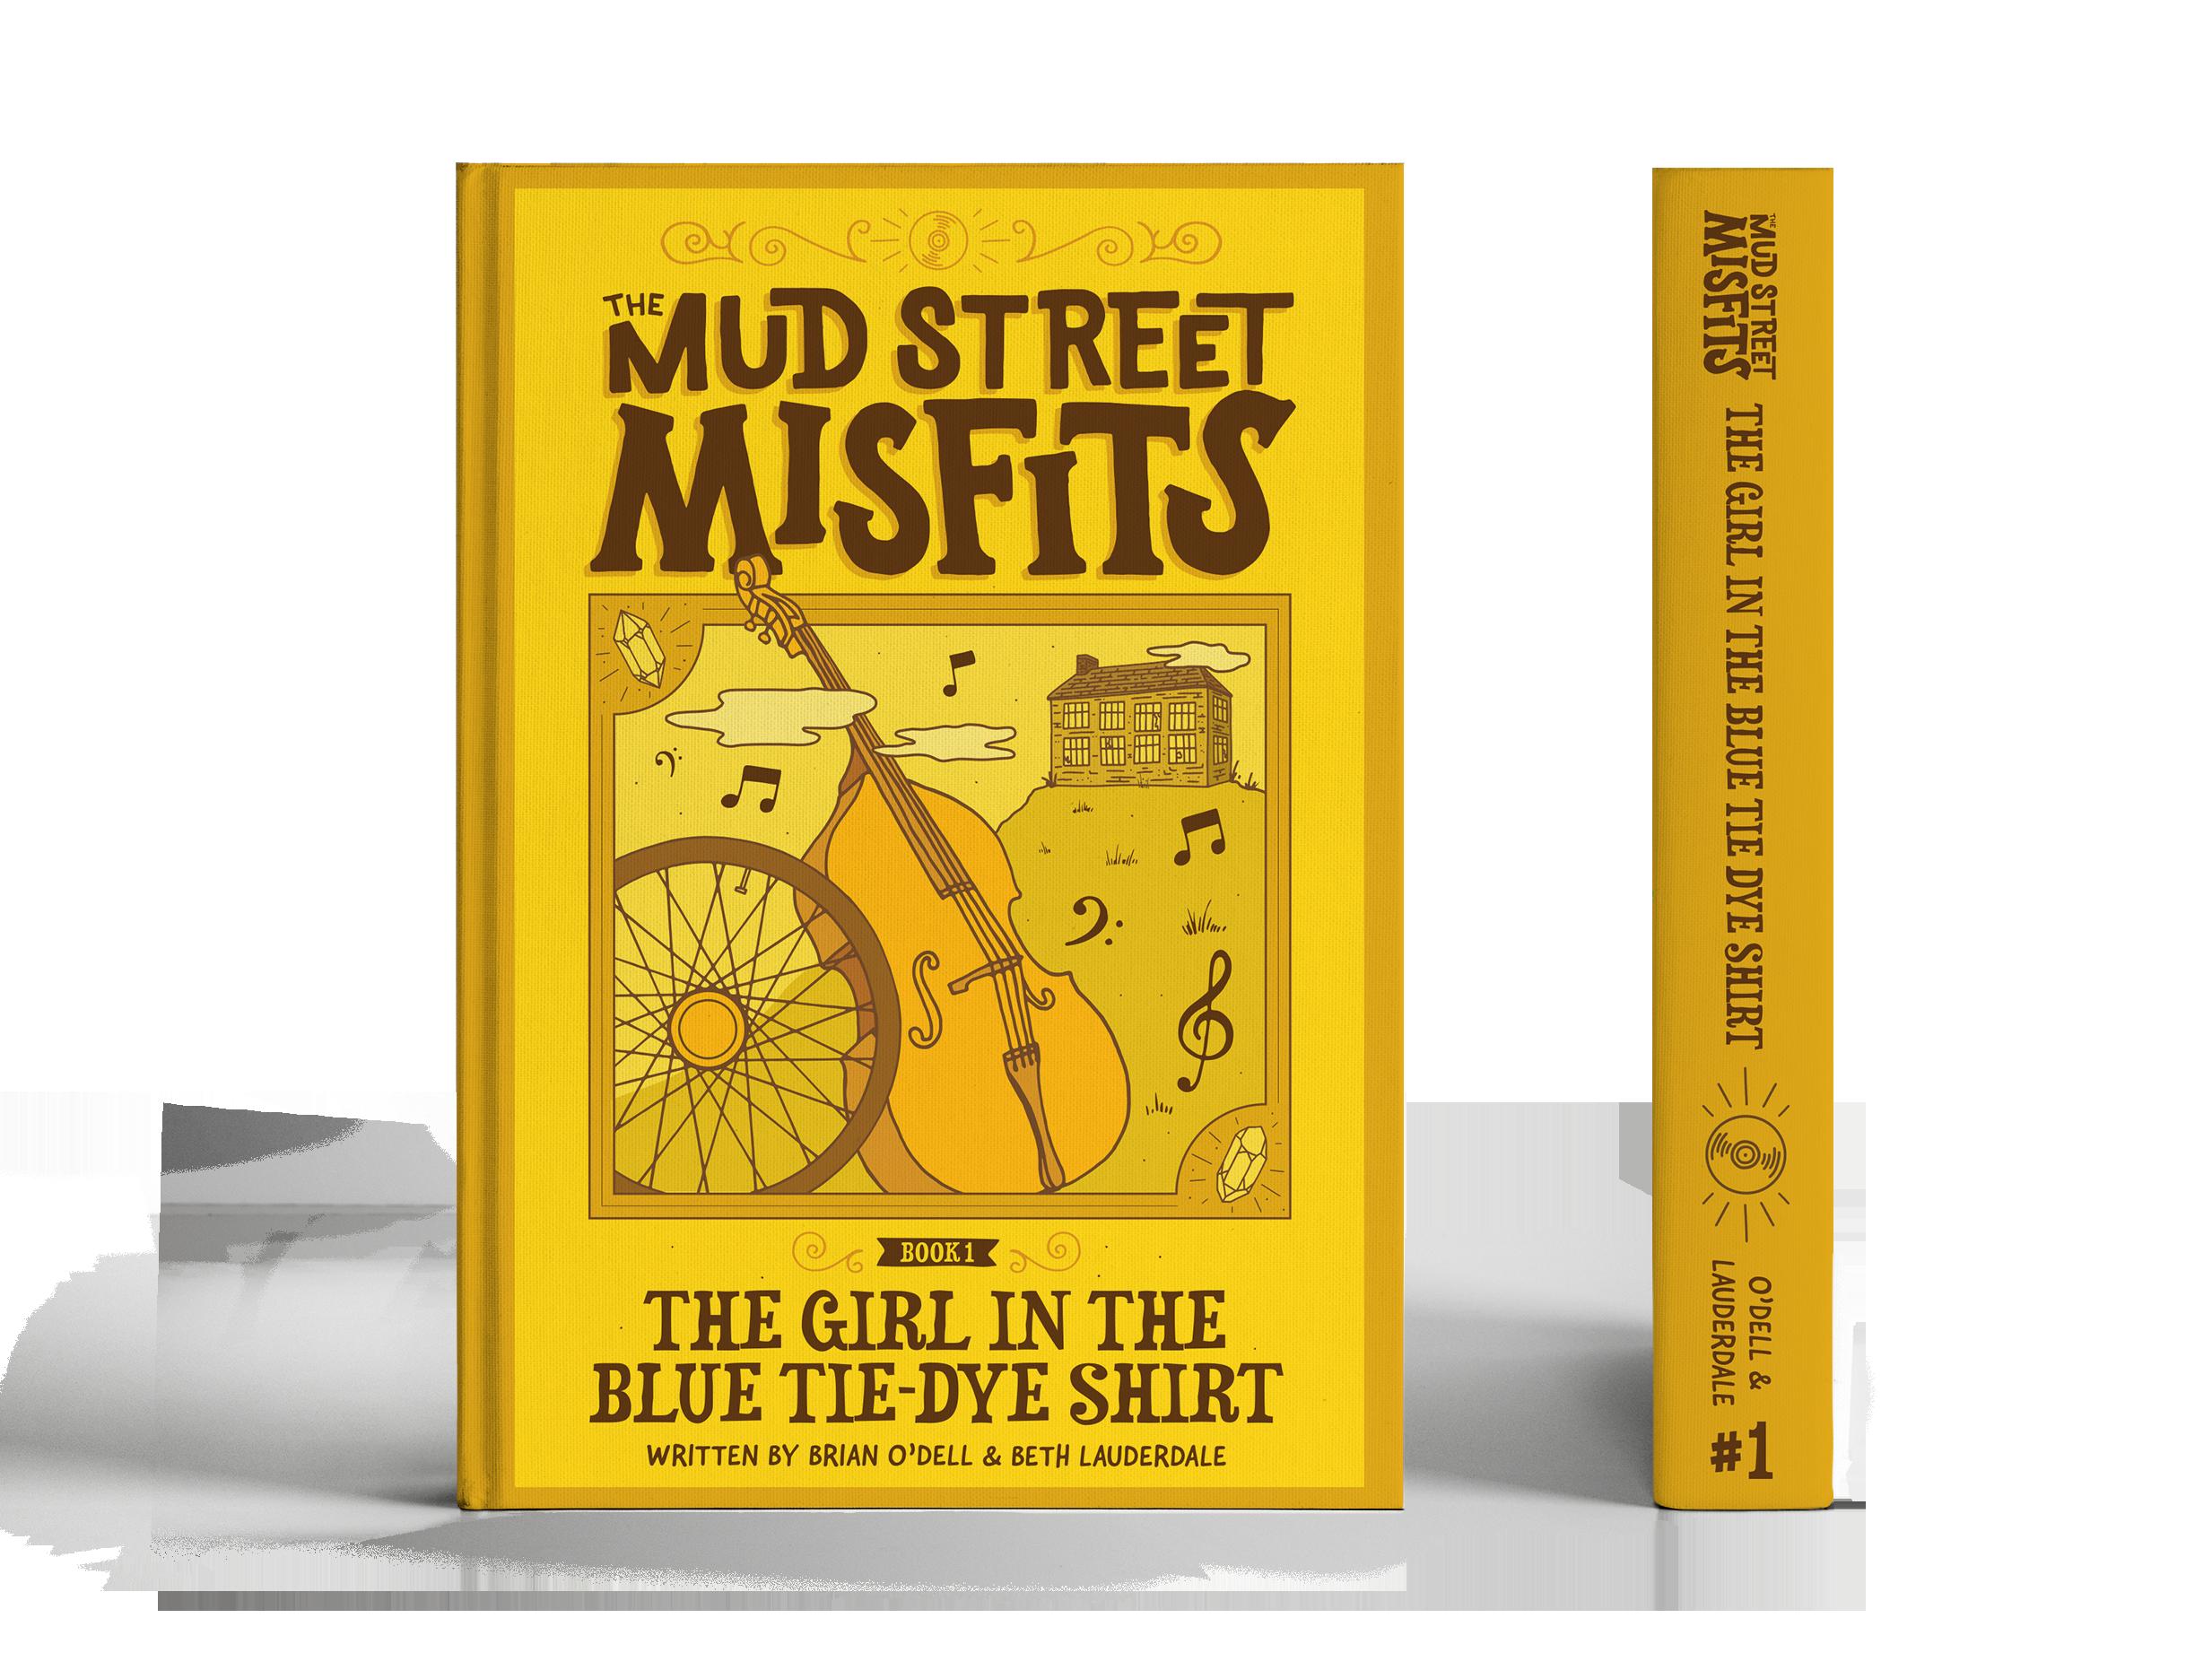 MSM_Book1_MockUp.png